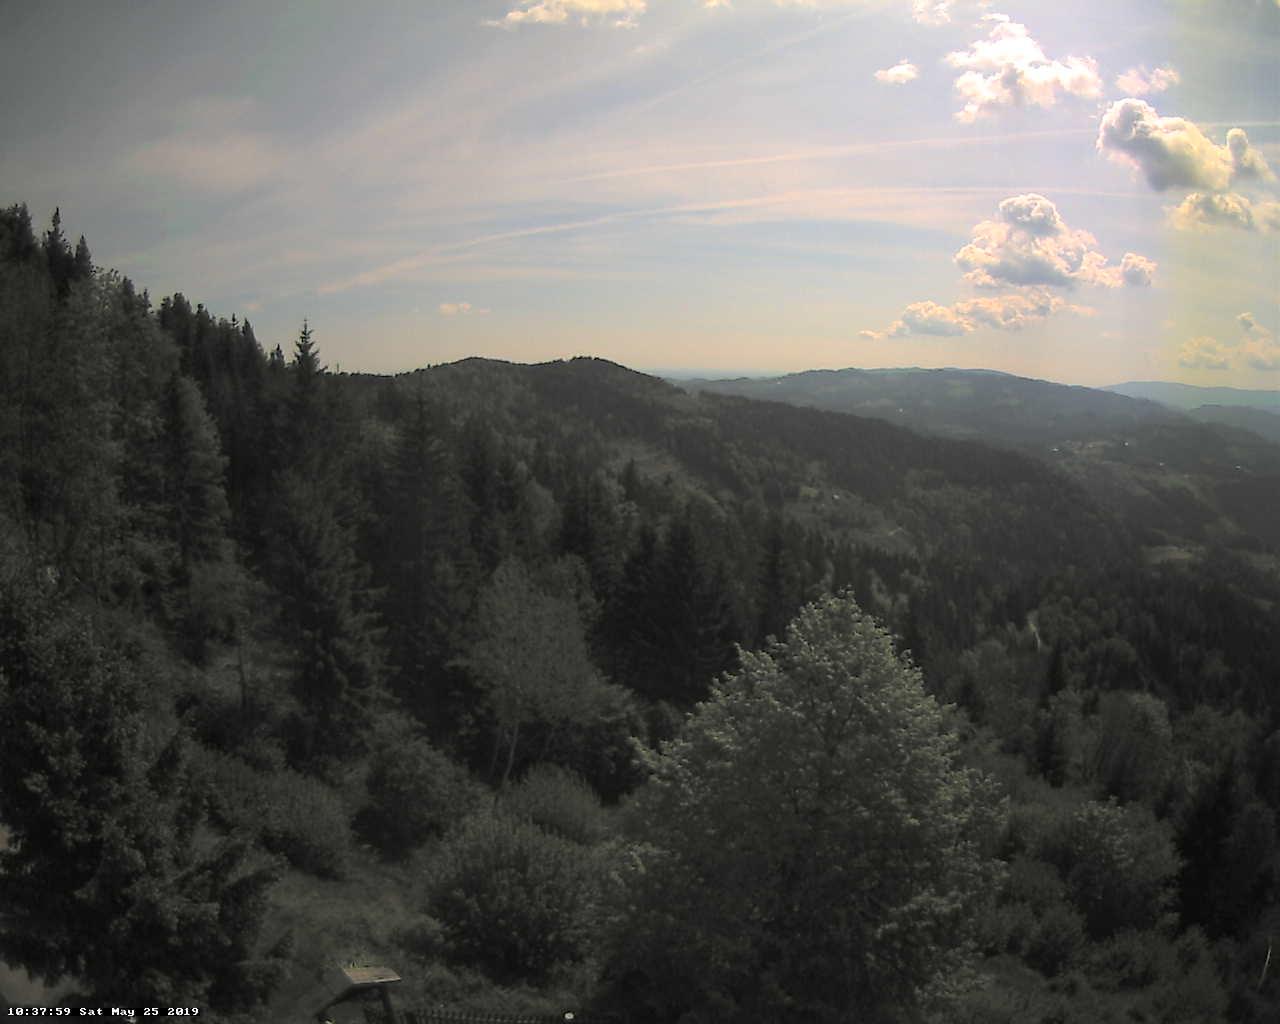 Kapunar, Pogled s Kapunarja - Slovenia